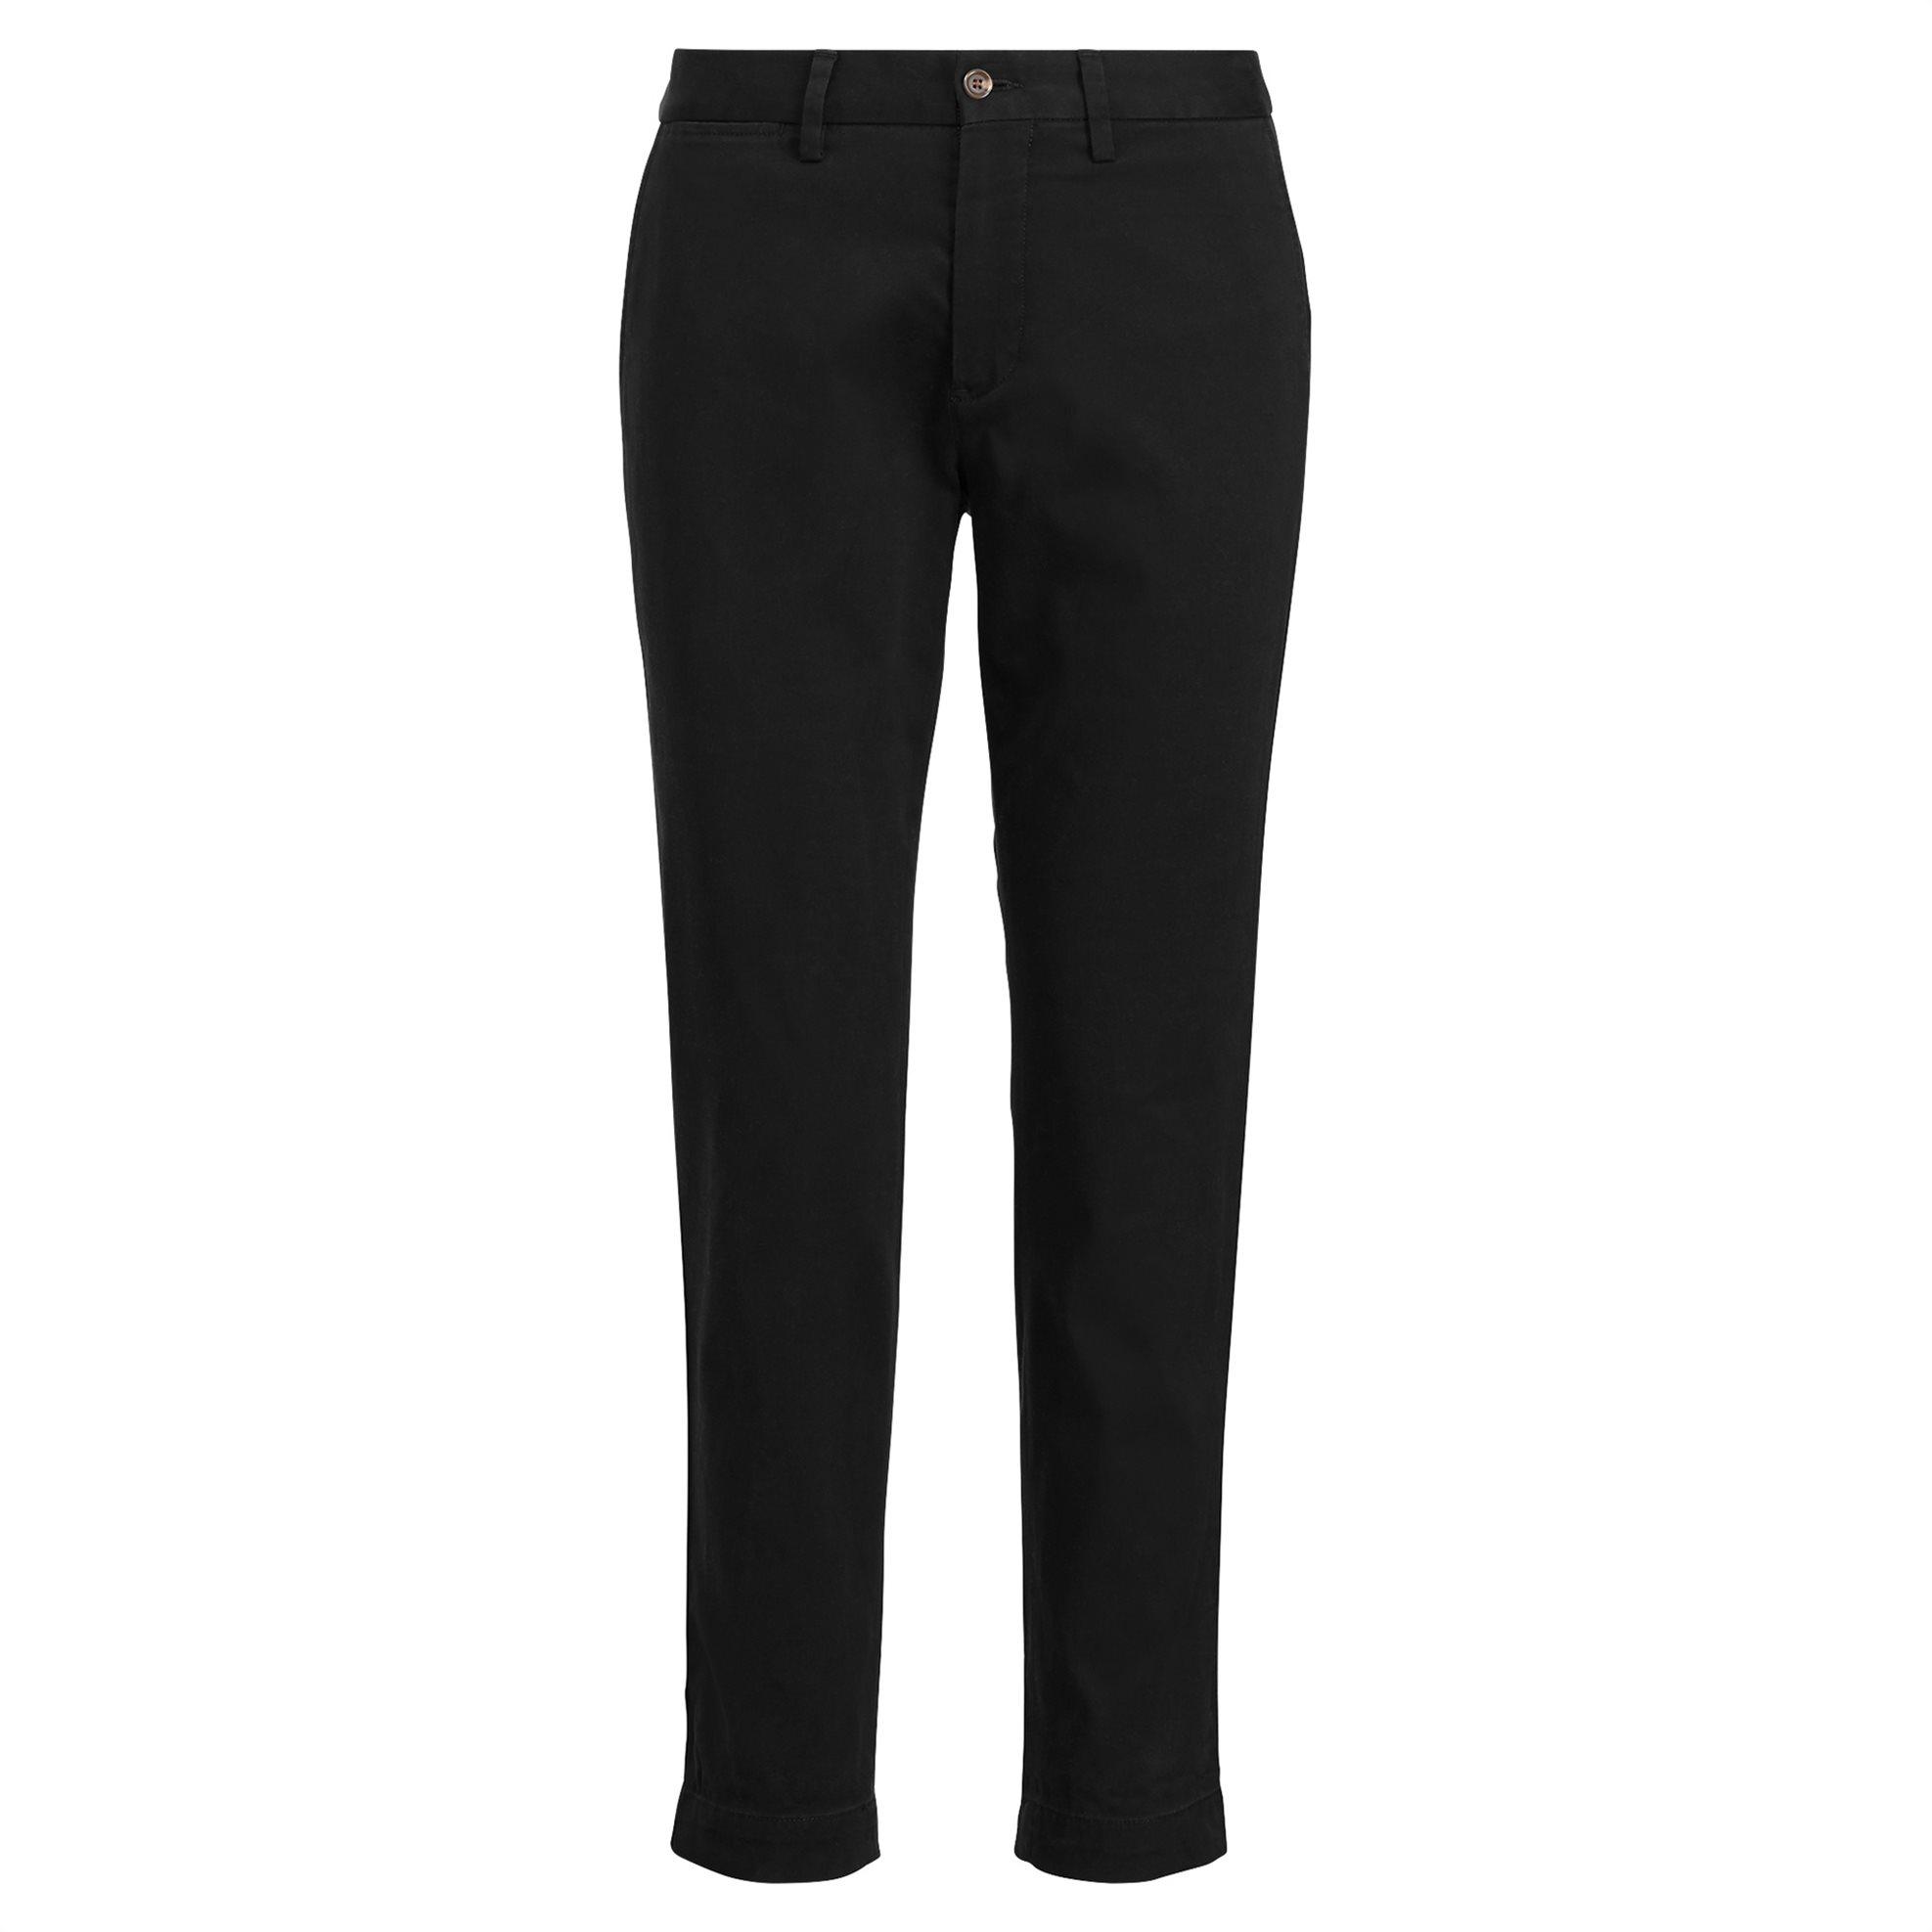 Polo Ralph Lauren γυναικείο παντελόνι Stretch Cotton Straight Pant Black - 21173 γυναικα   ρουχα   παντελόνια   ίσια γραμμή